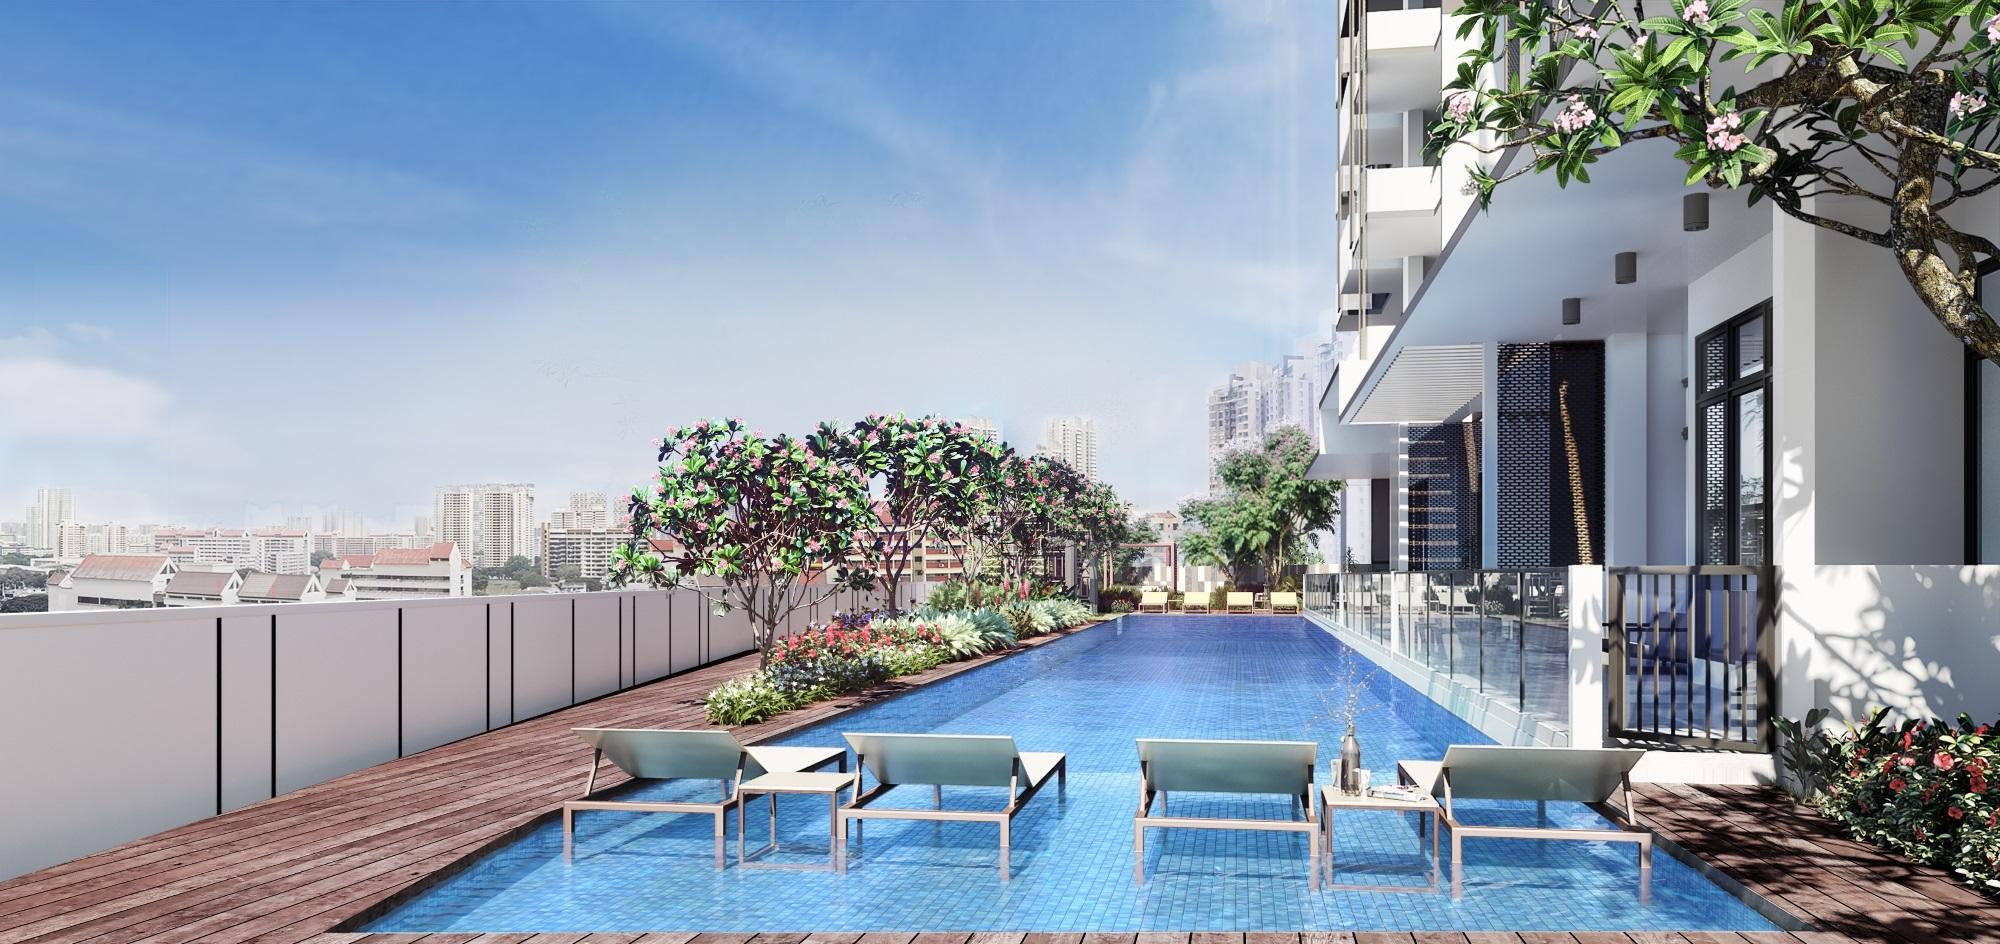 Buying Condo in Singapore - swimming pool